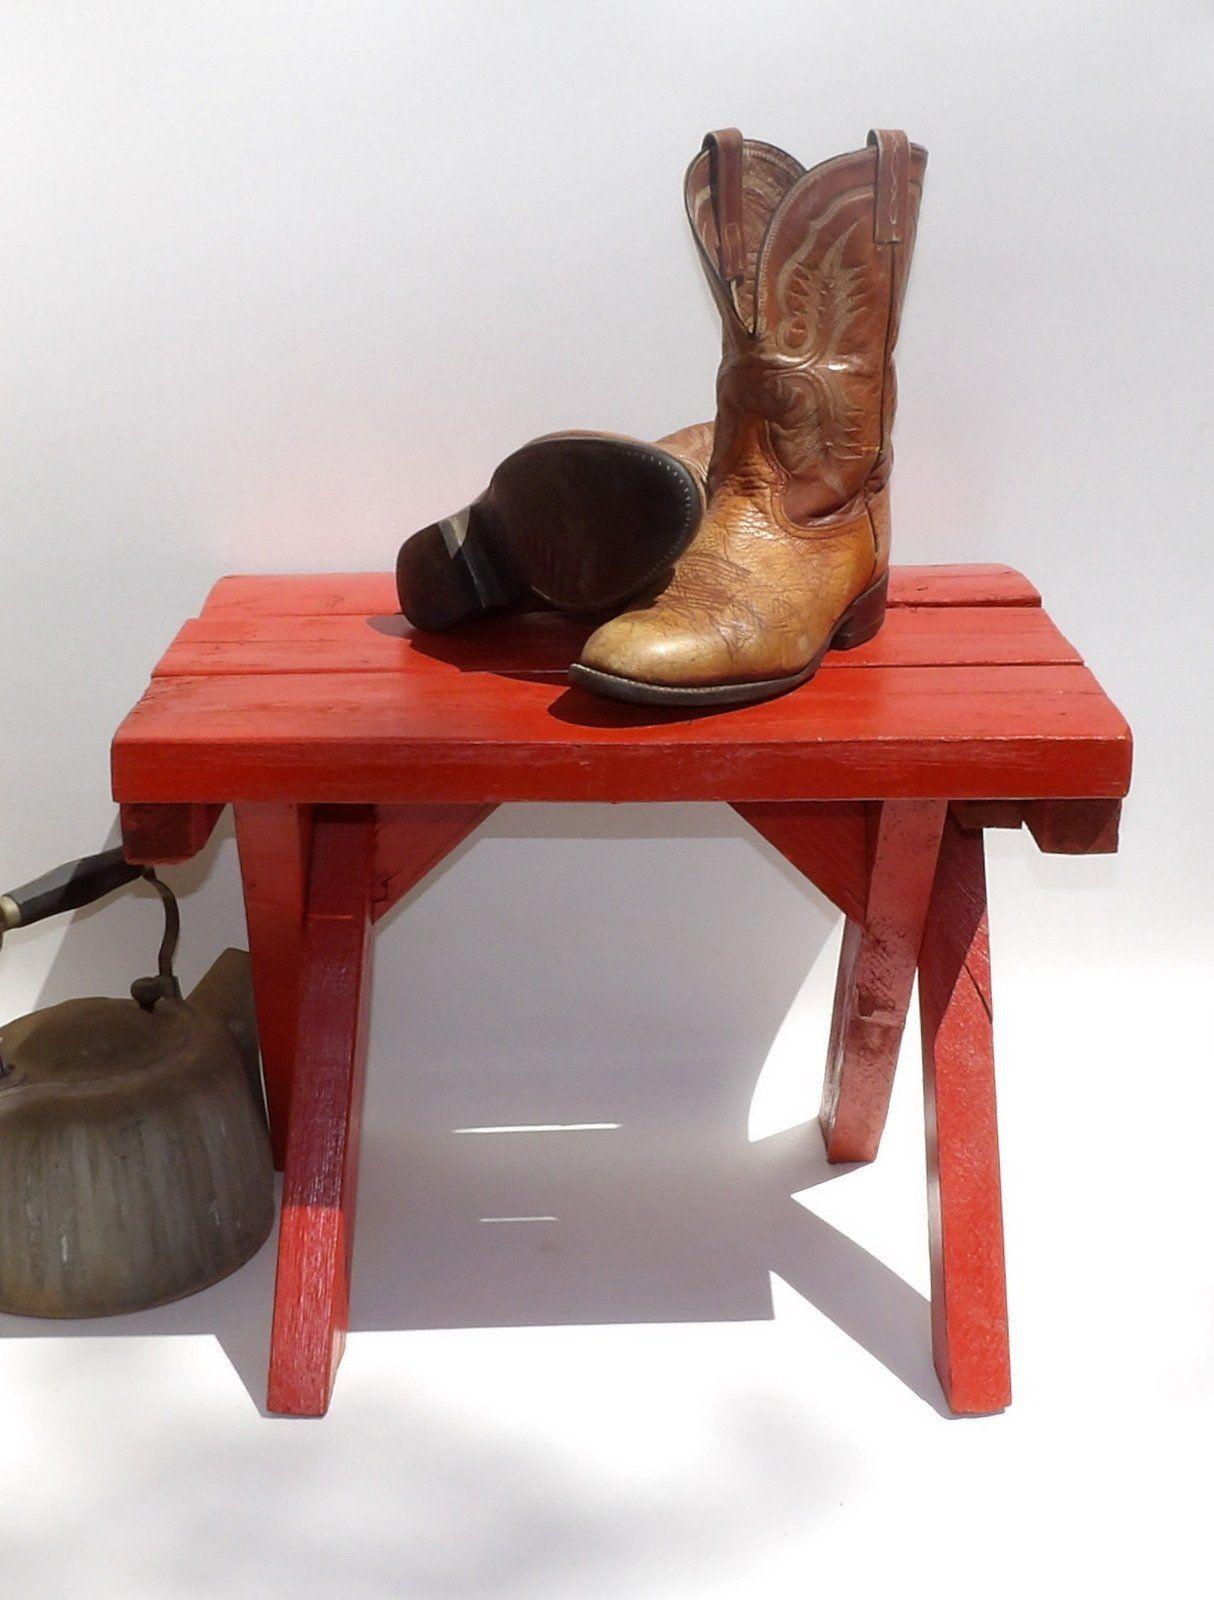 Window decor and more orange beach  rustic red wood orange bench vintage footstool vintage rustic bench